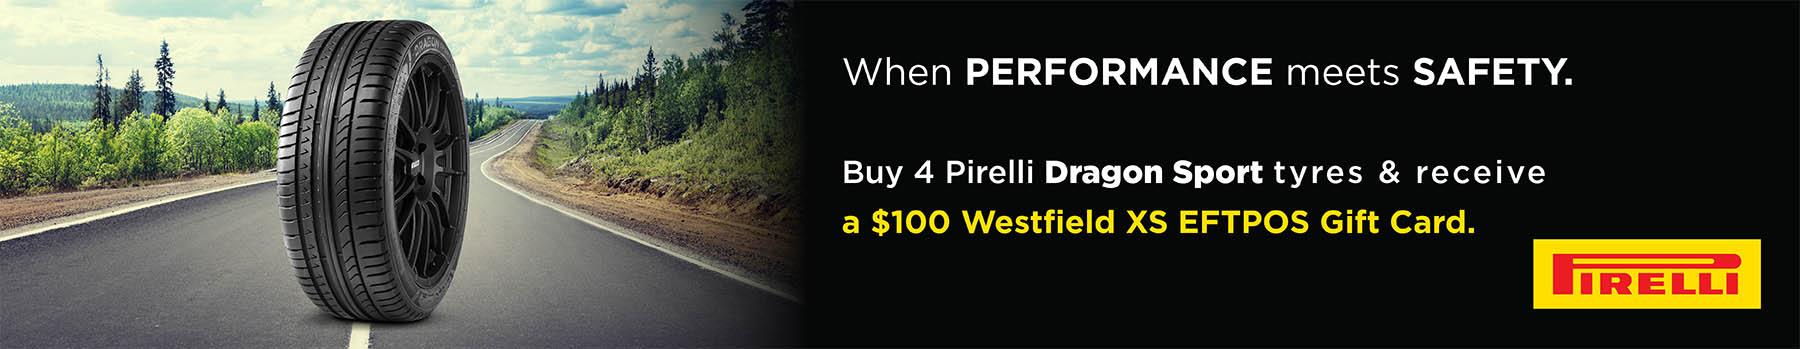 Pirelli $100 Gift Card